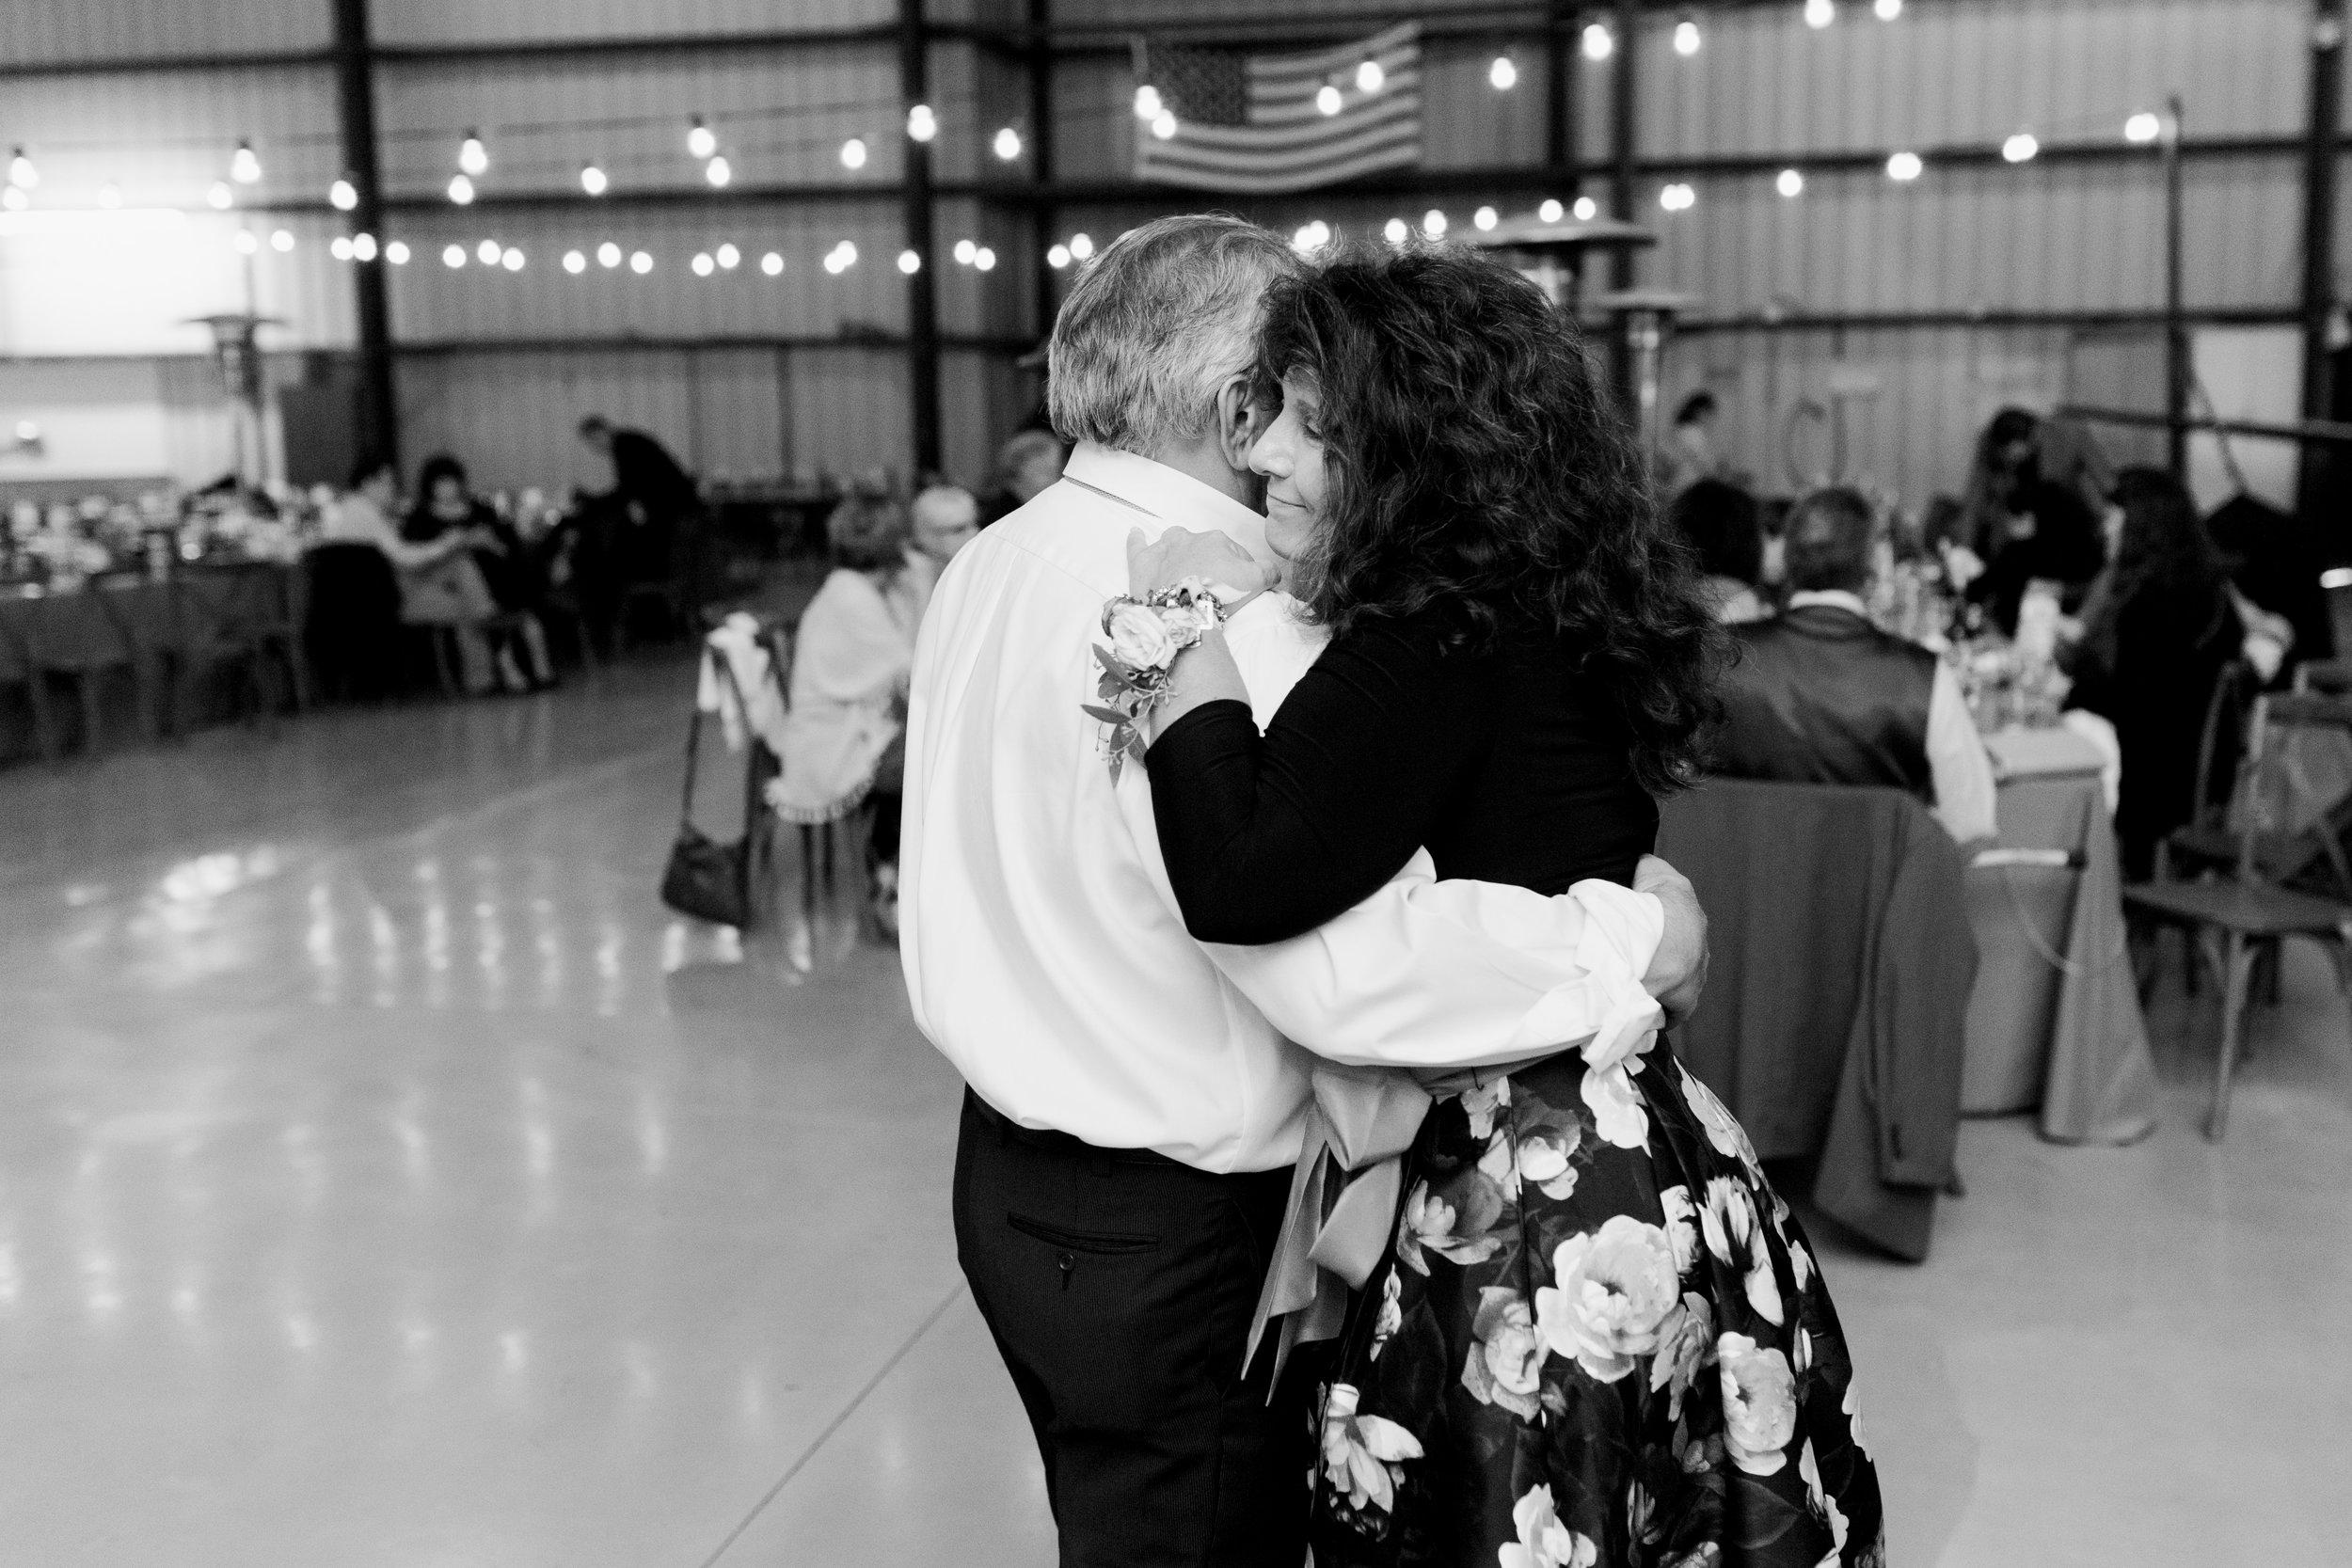 airport-hanger-wedding-at-attitude-aviation-in-livermore-131.jpg